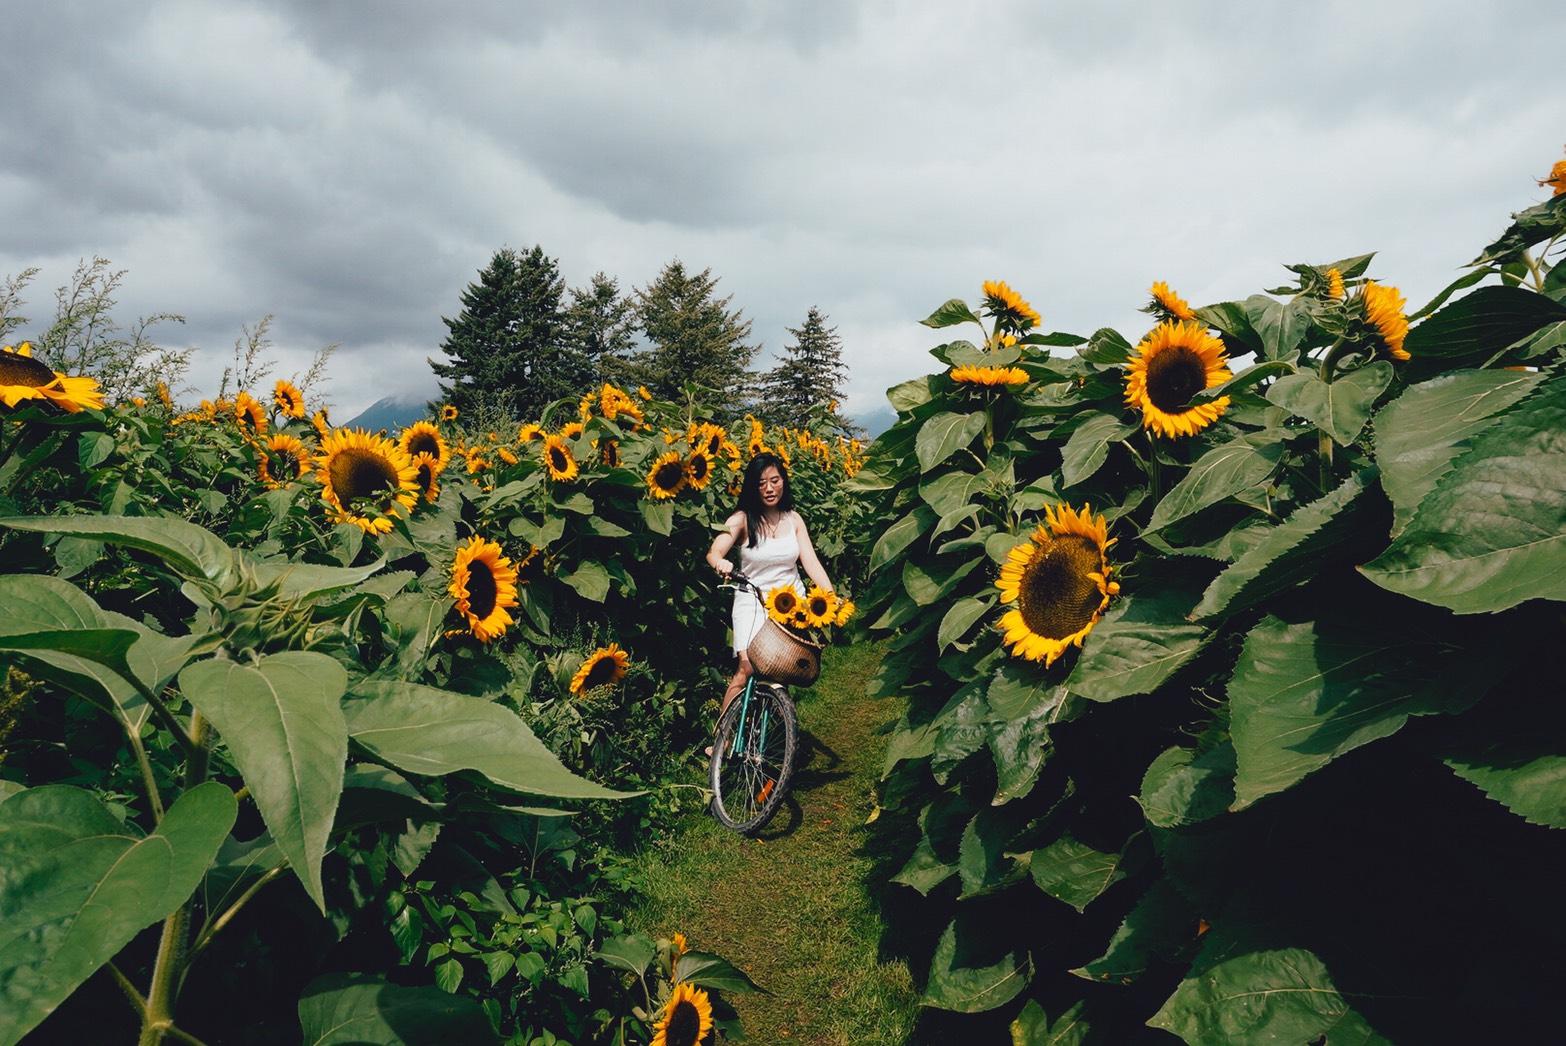 Sunflower Festival Chilliwack BC Canada